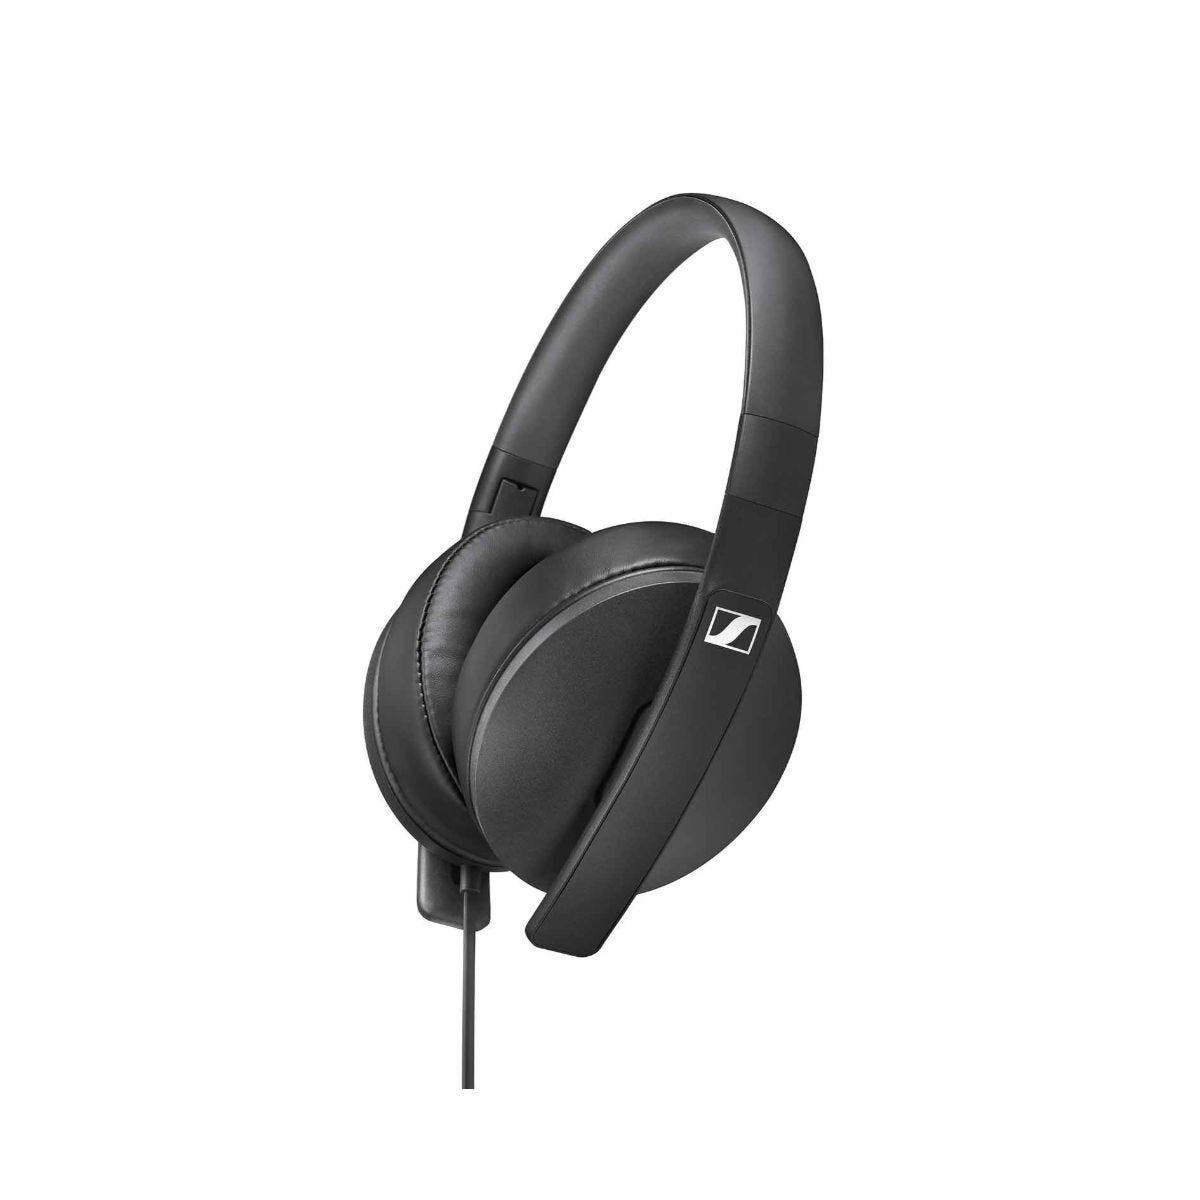 Sennheiser HD300 Wired Over-Ear Headphones